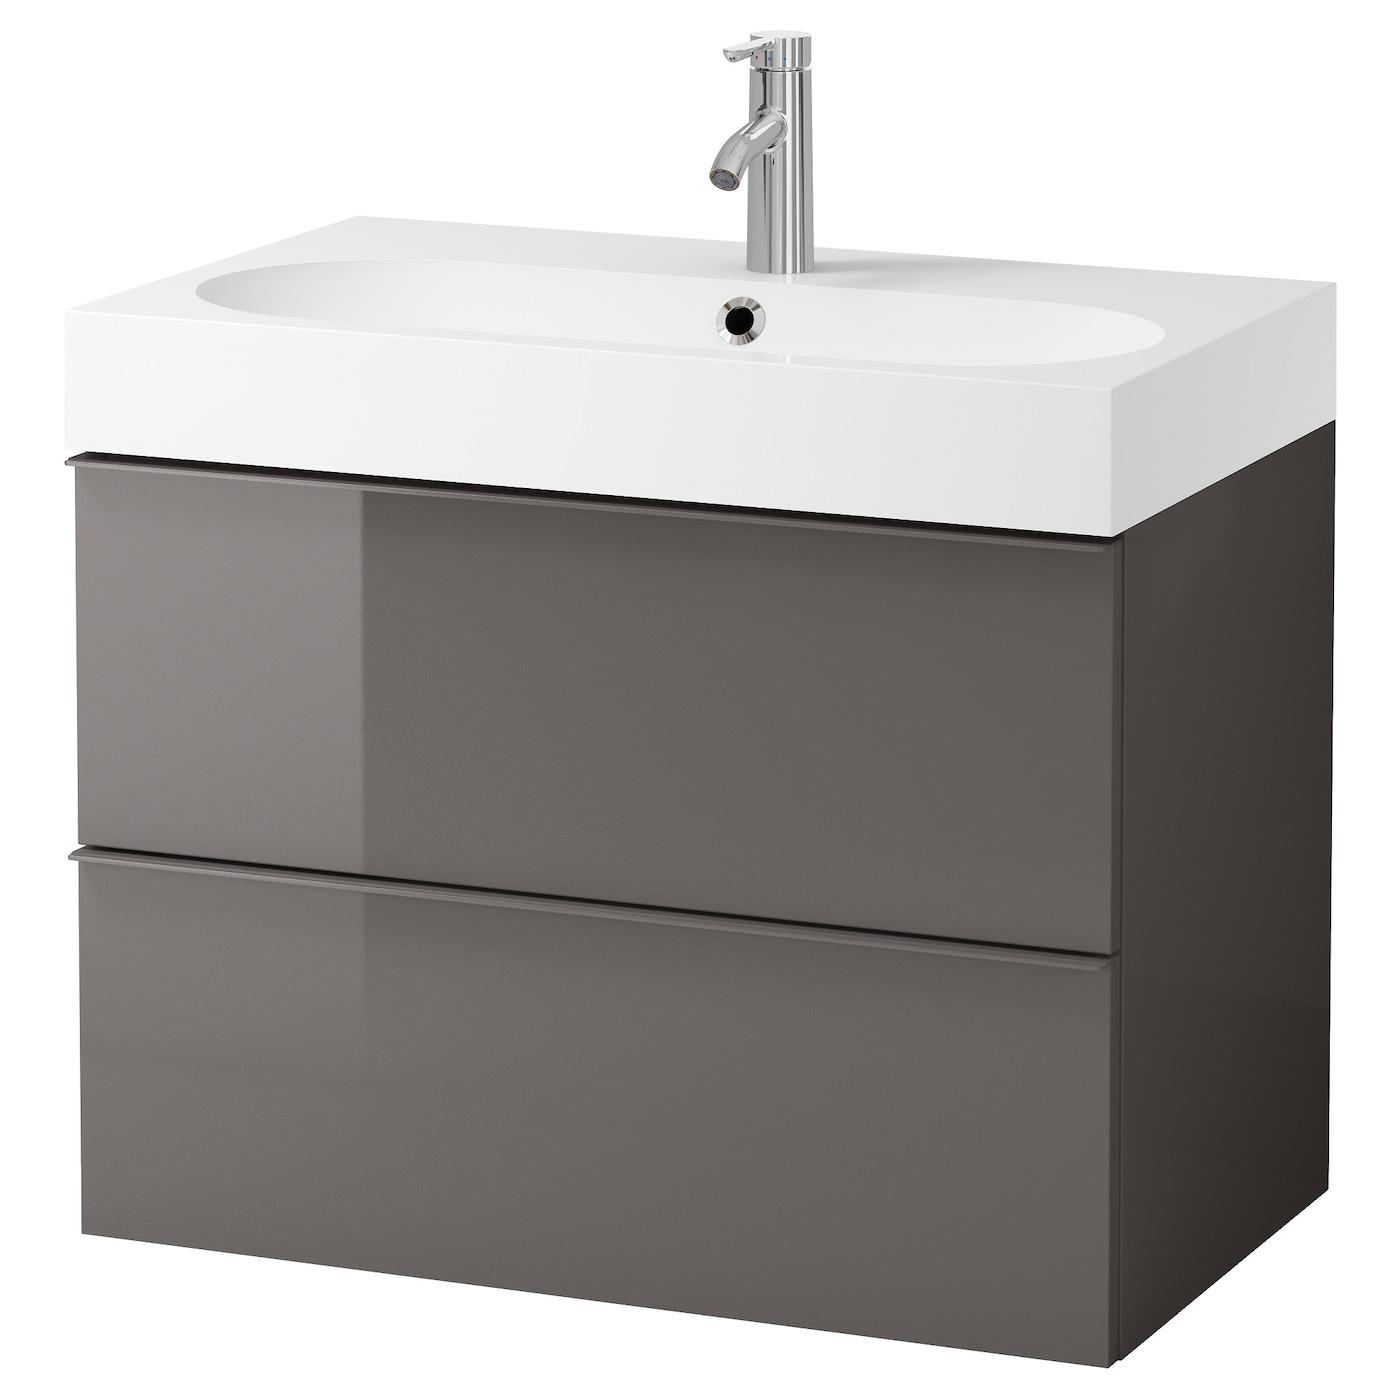 br viken godmorgon meuble lavabo 2tir brillant gris 80x49x68 cm ikea. Black Bedroom Furniture Sets. Home Design Ideas